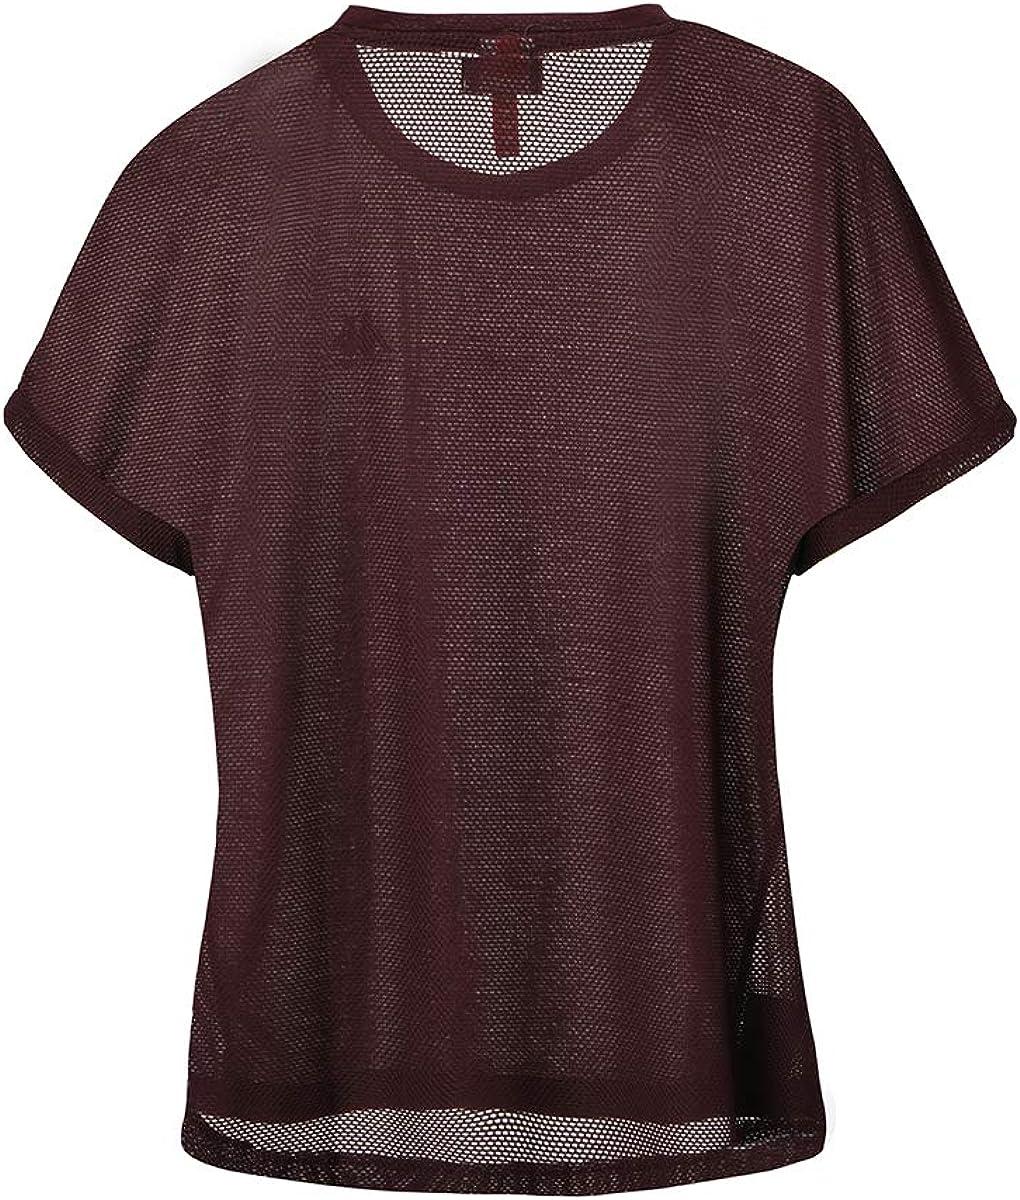 Kappa Yui Camiseta para Mujer